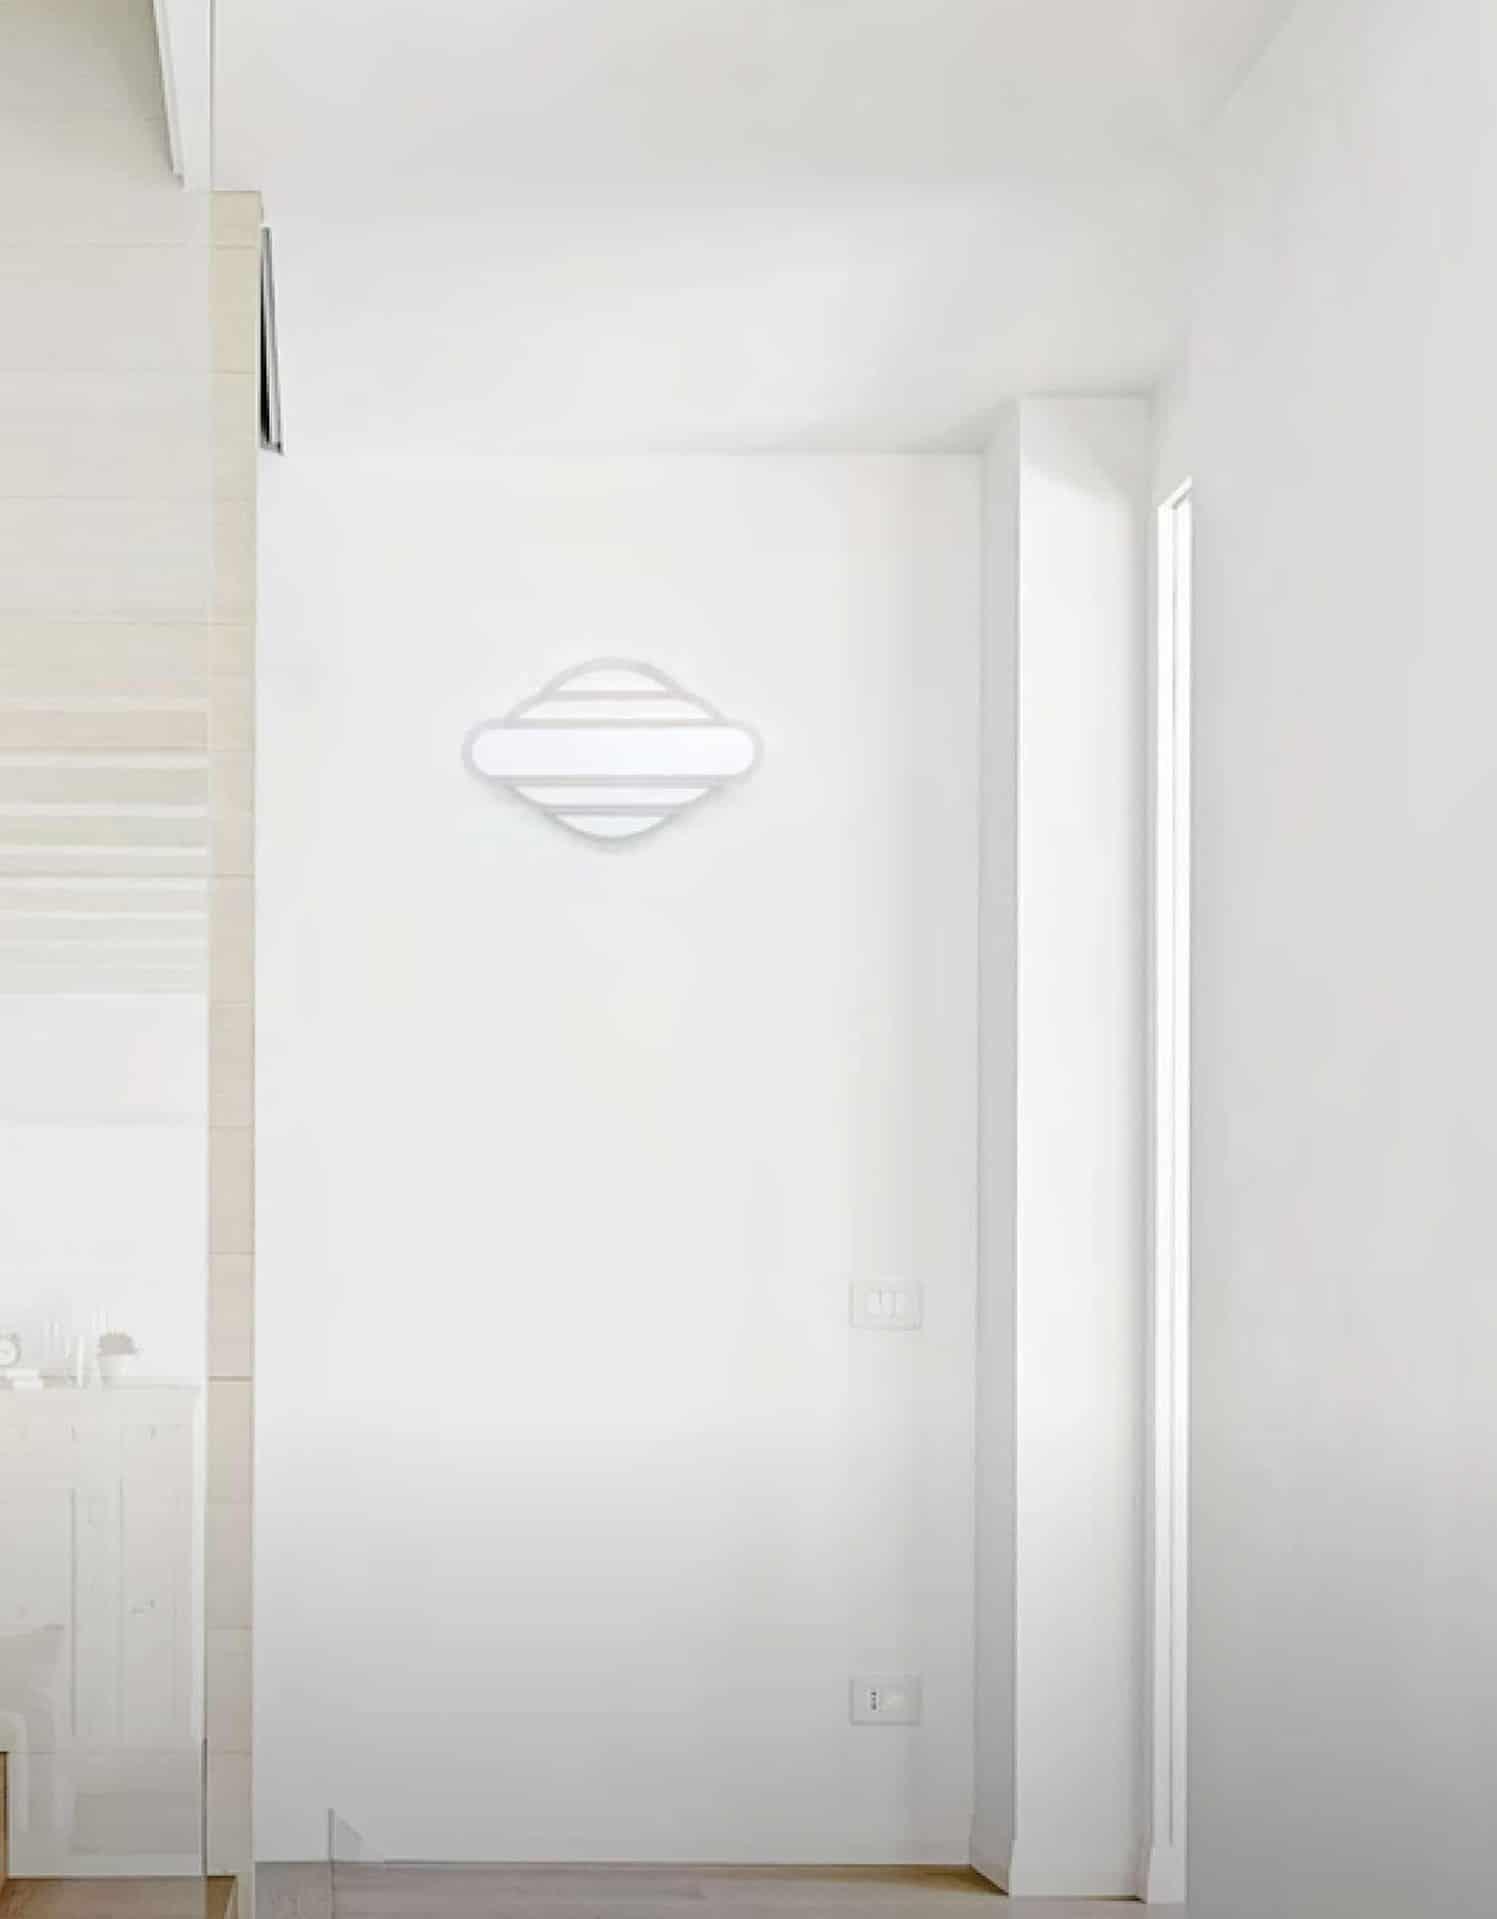 Aplica LED Kelektron Retro, 30W, alb, dimabil